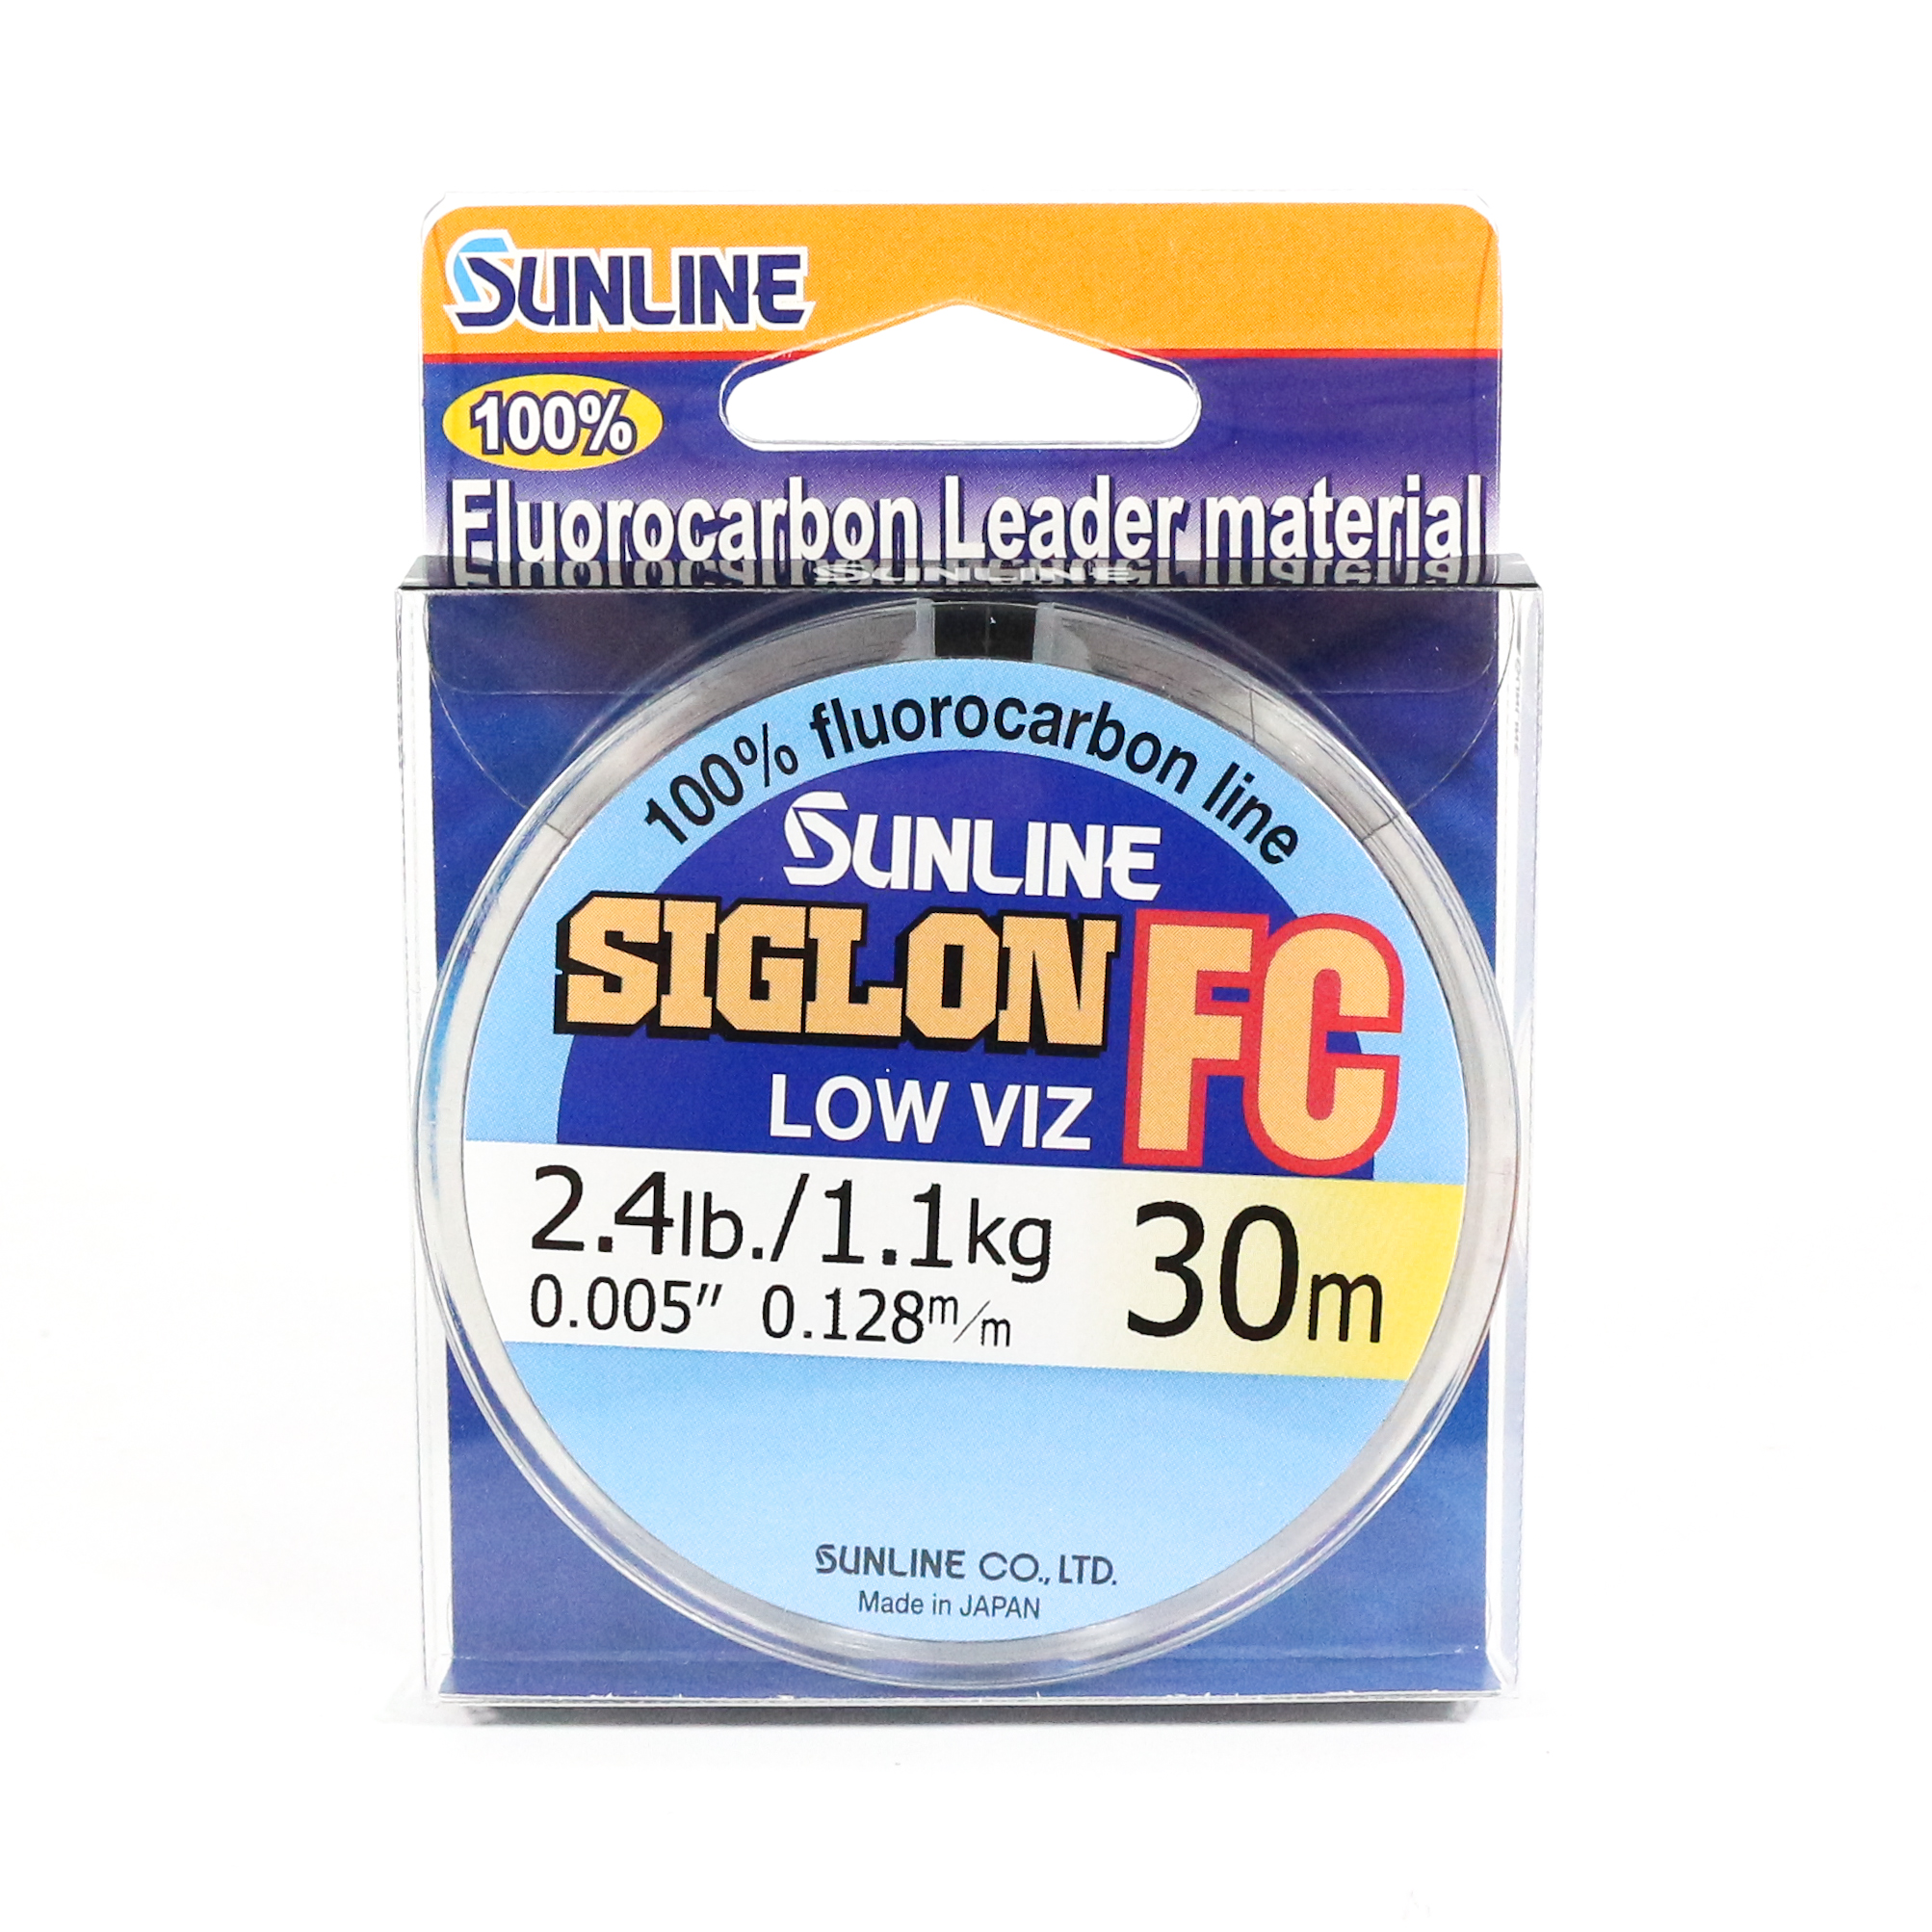 Sunline Siglon FC Fluorocarbon Line 30m 2.4lb Diameter 0.128 mm (5686)